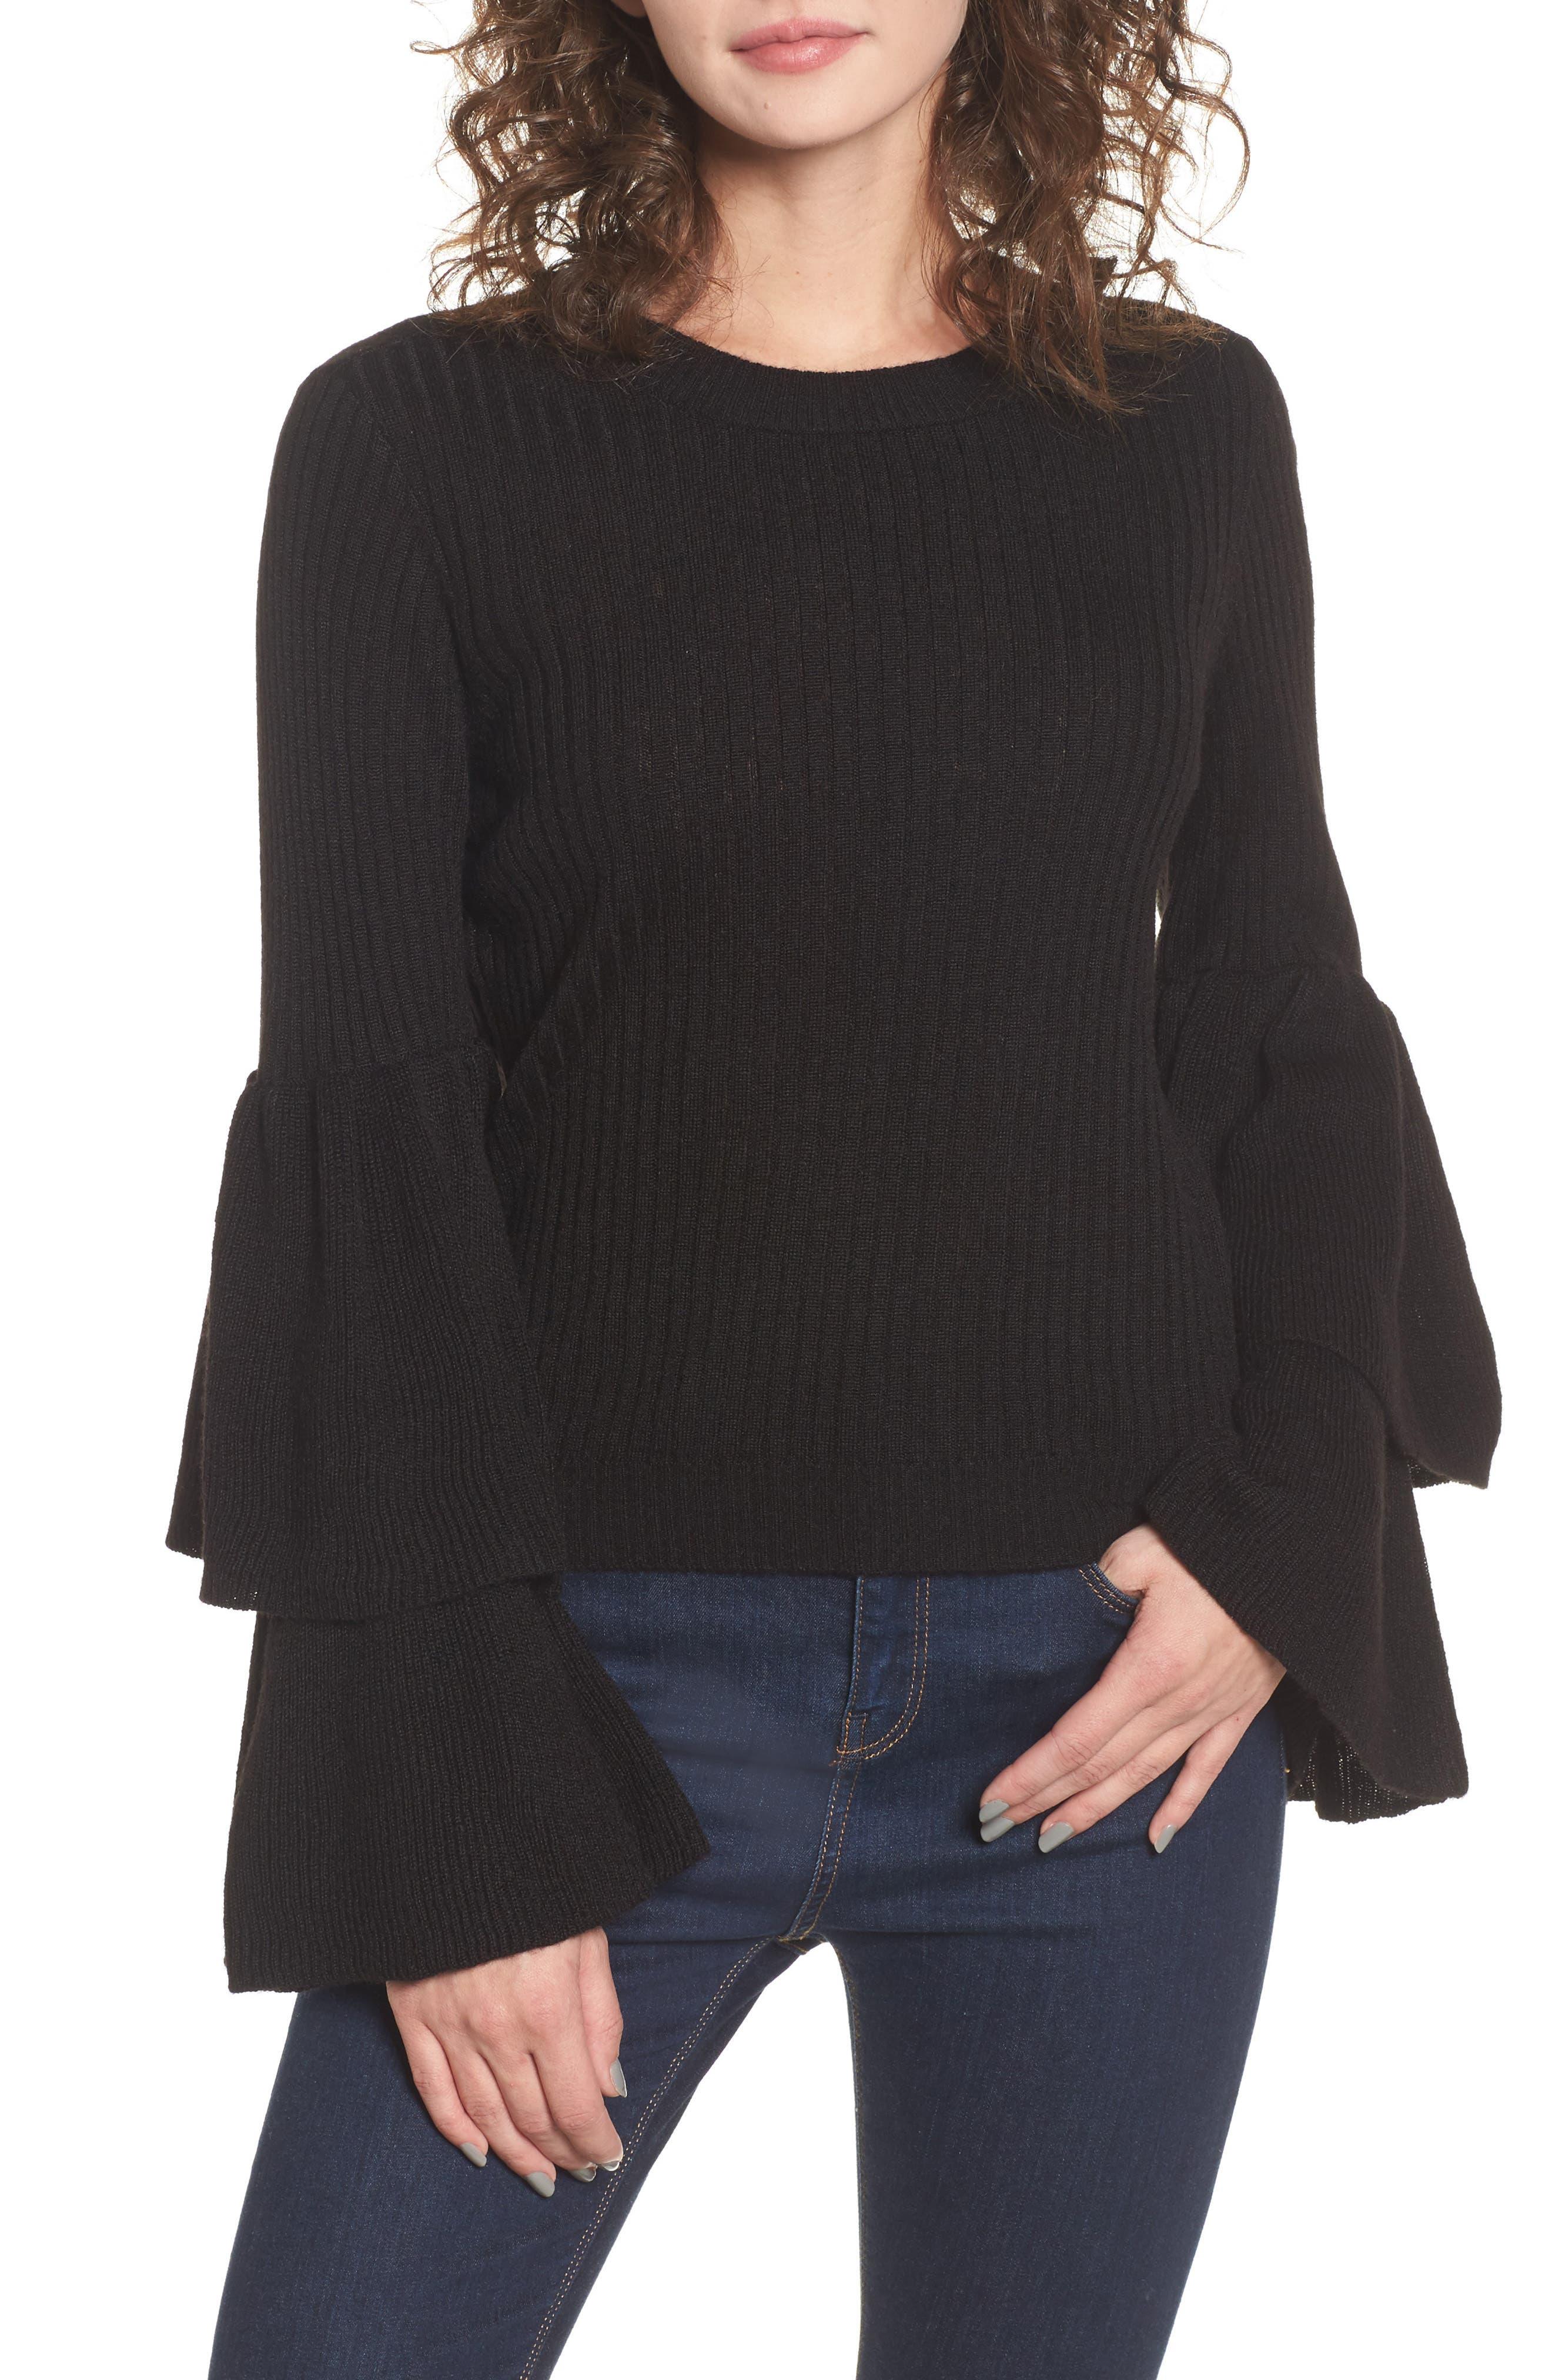 devlin Tiara Bell Sleeve Sweater